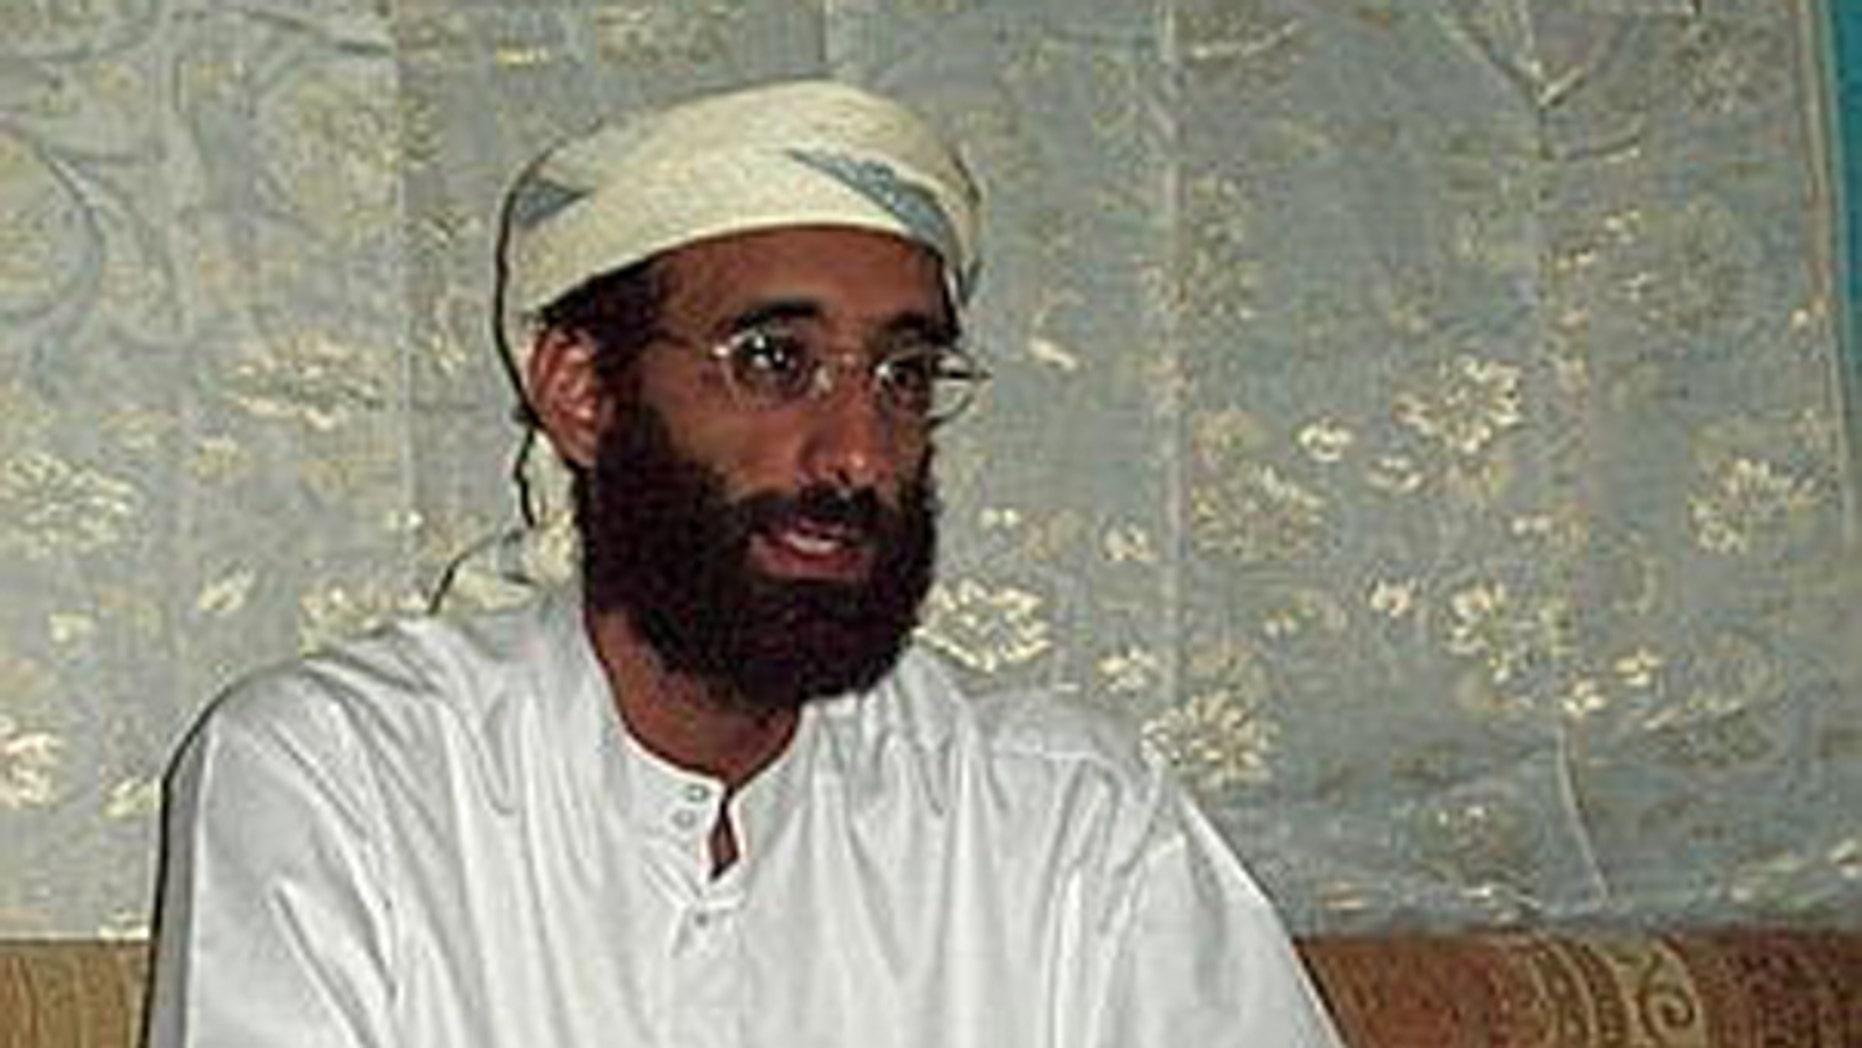 Radical Yemeni-American cleric Anwar al-Awlaki